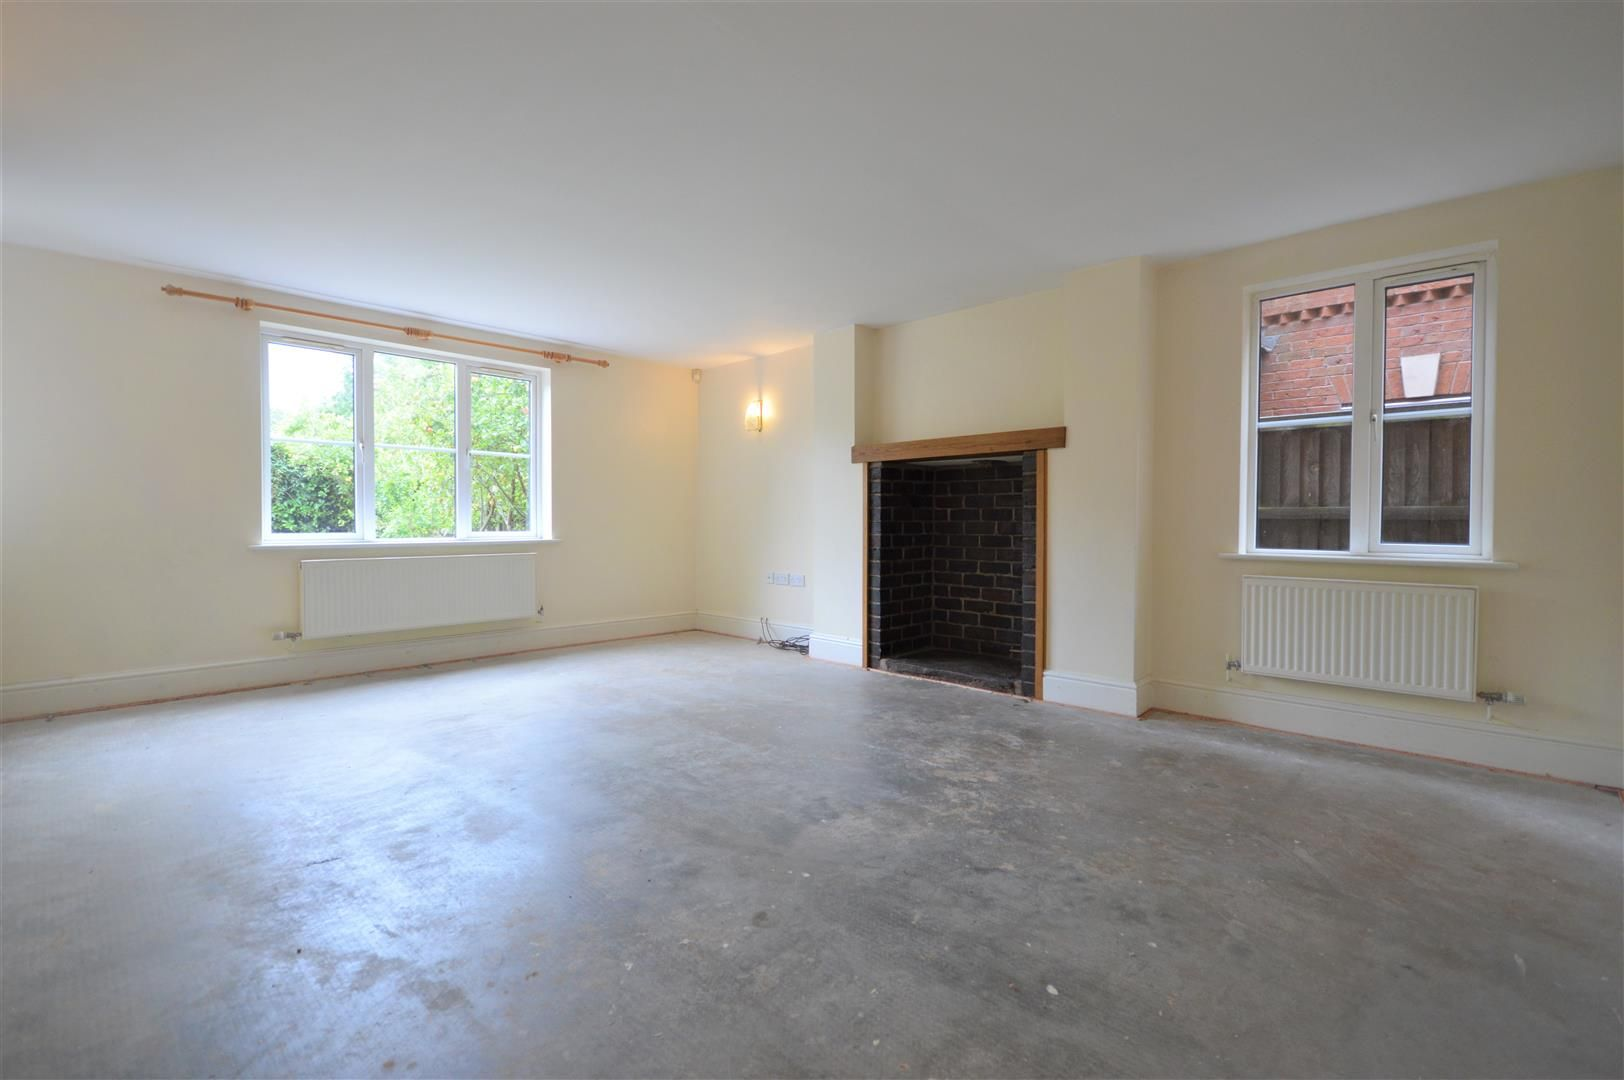 4 bed detached for sale in Leominster 3